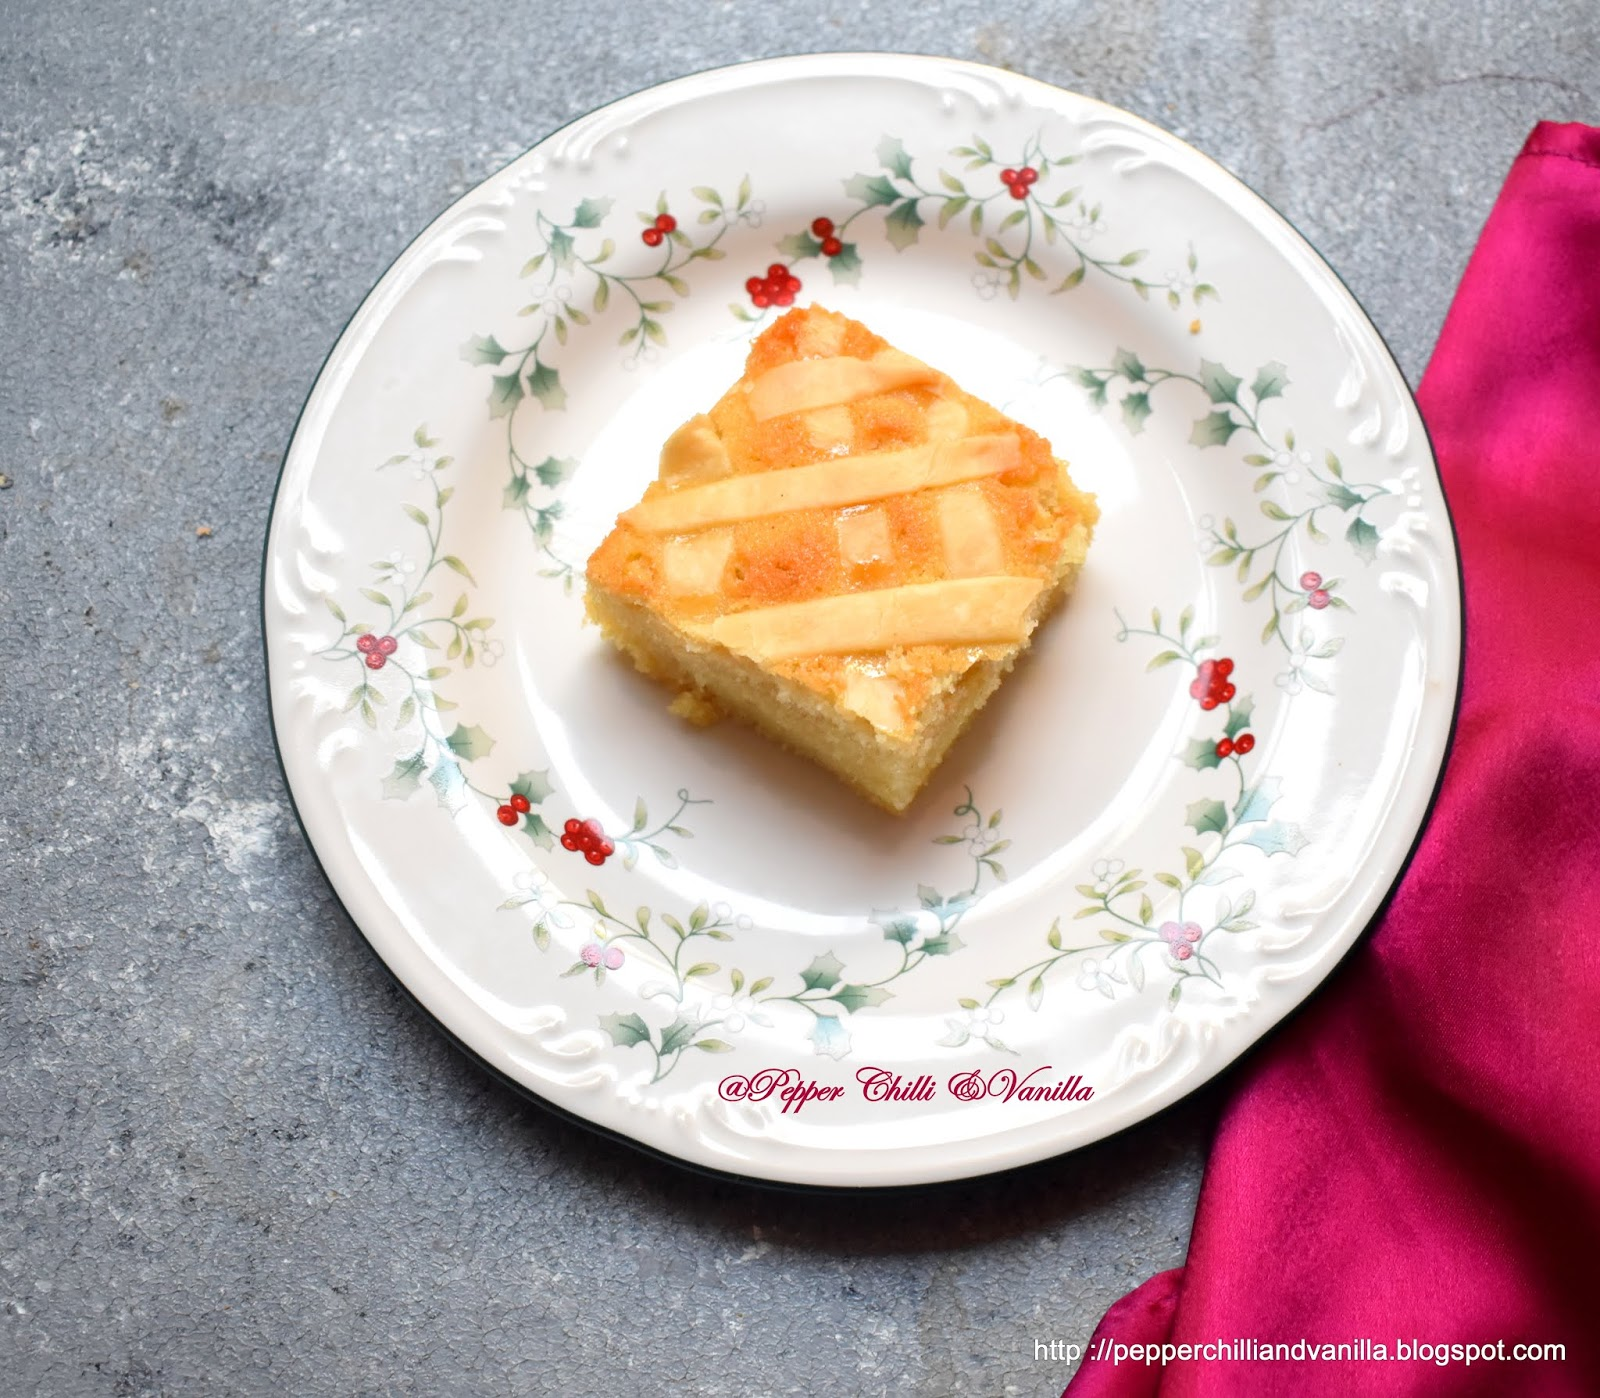 goan baath cake with lattice,tradtional goan  baath